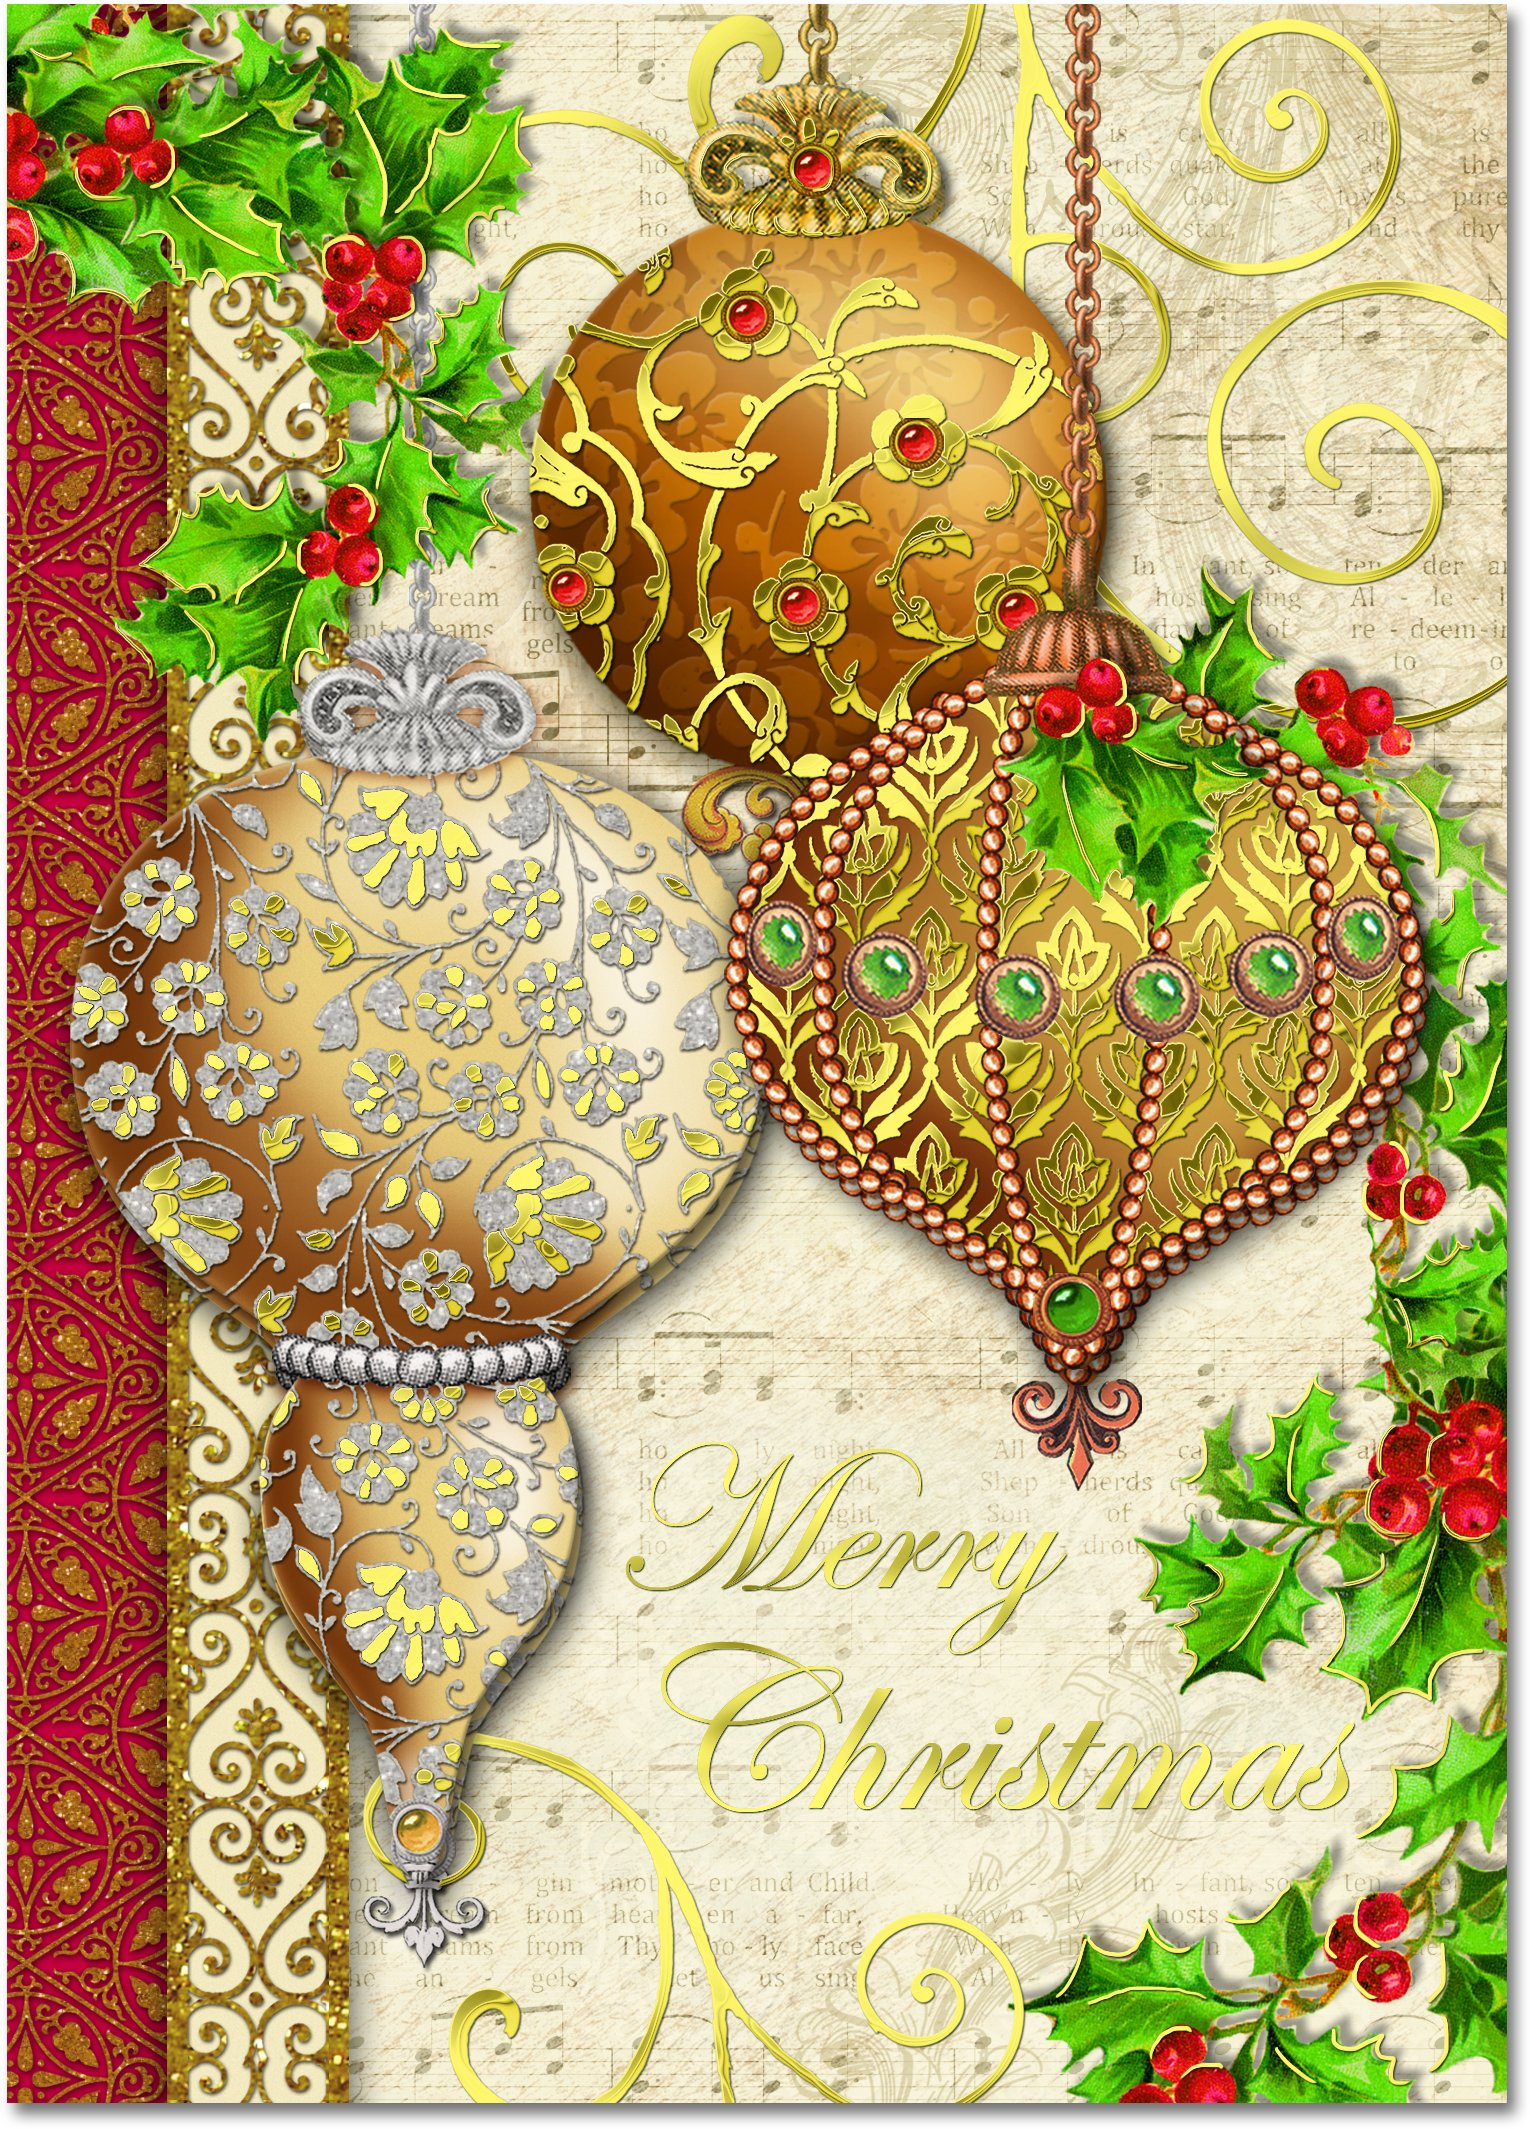 Amazon.com: Punch Studio Christmas Dimensional Greeting Cards ...